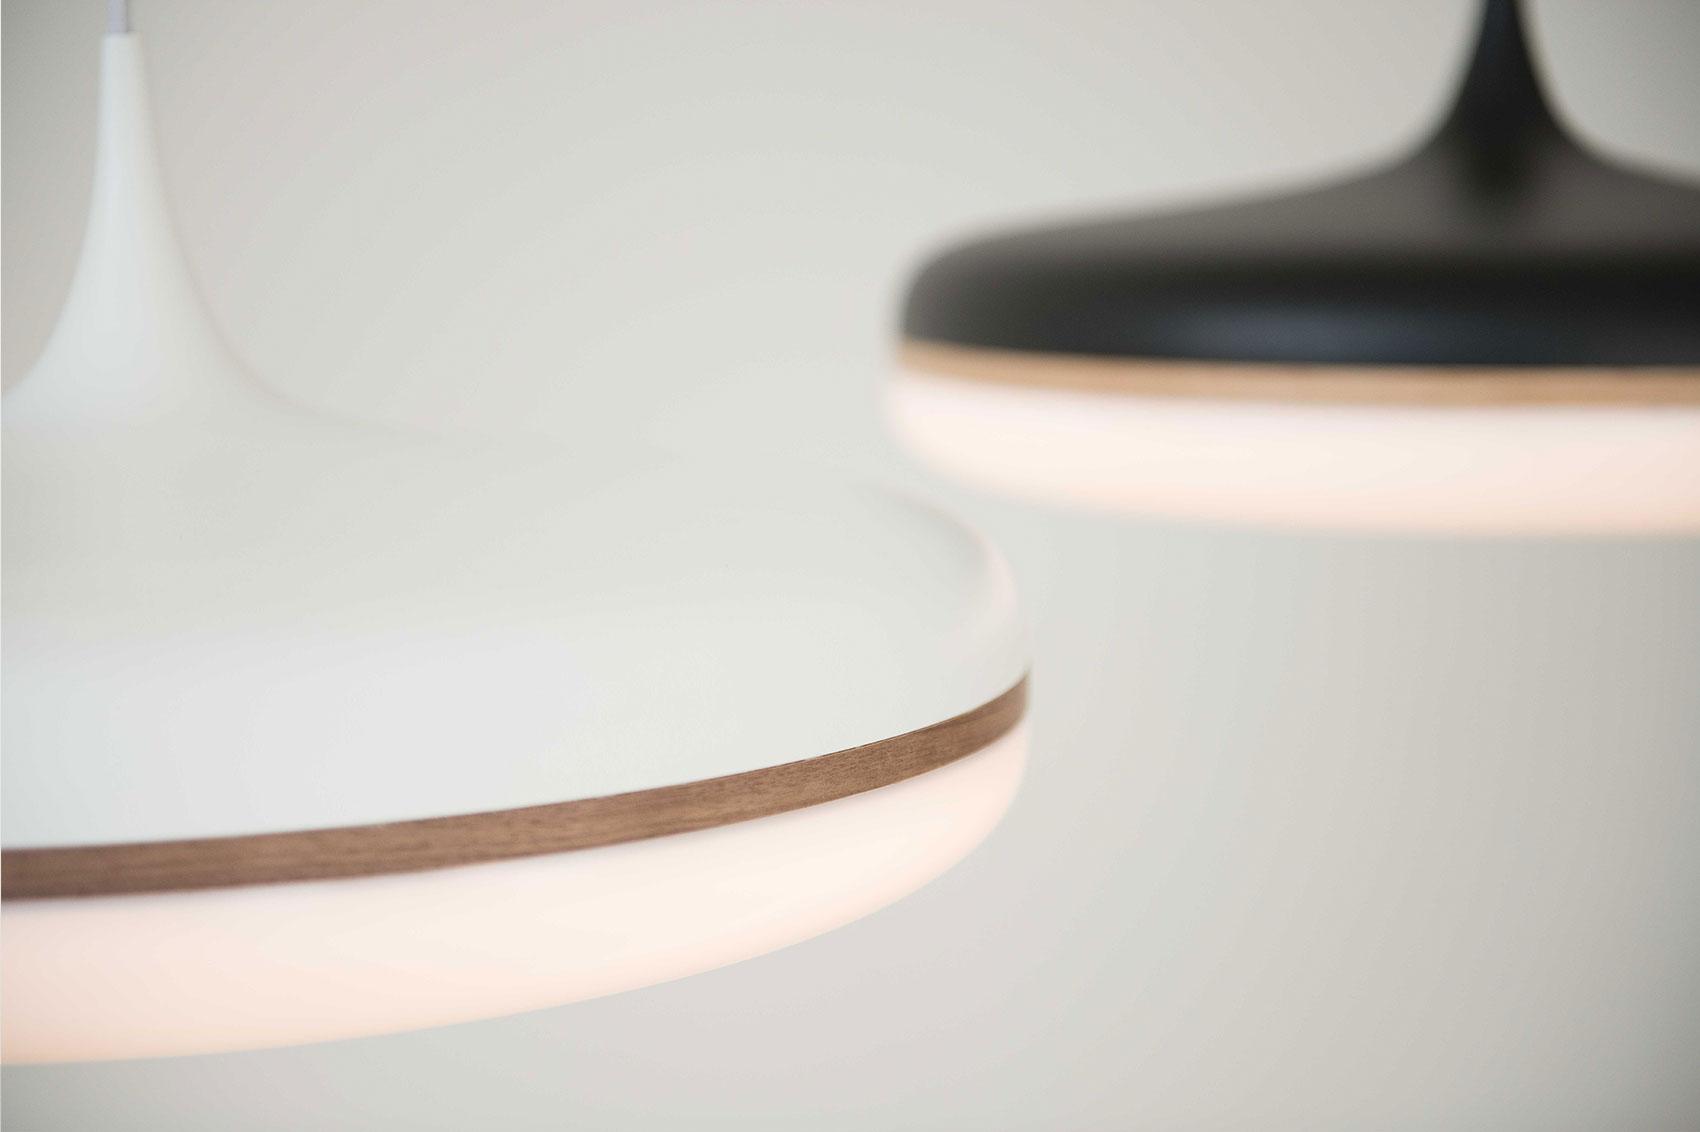 copper-lighting-droplet2.jpg